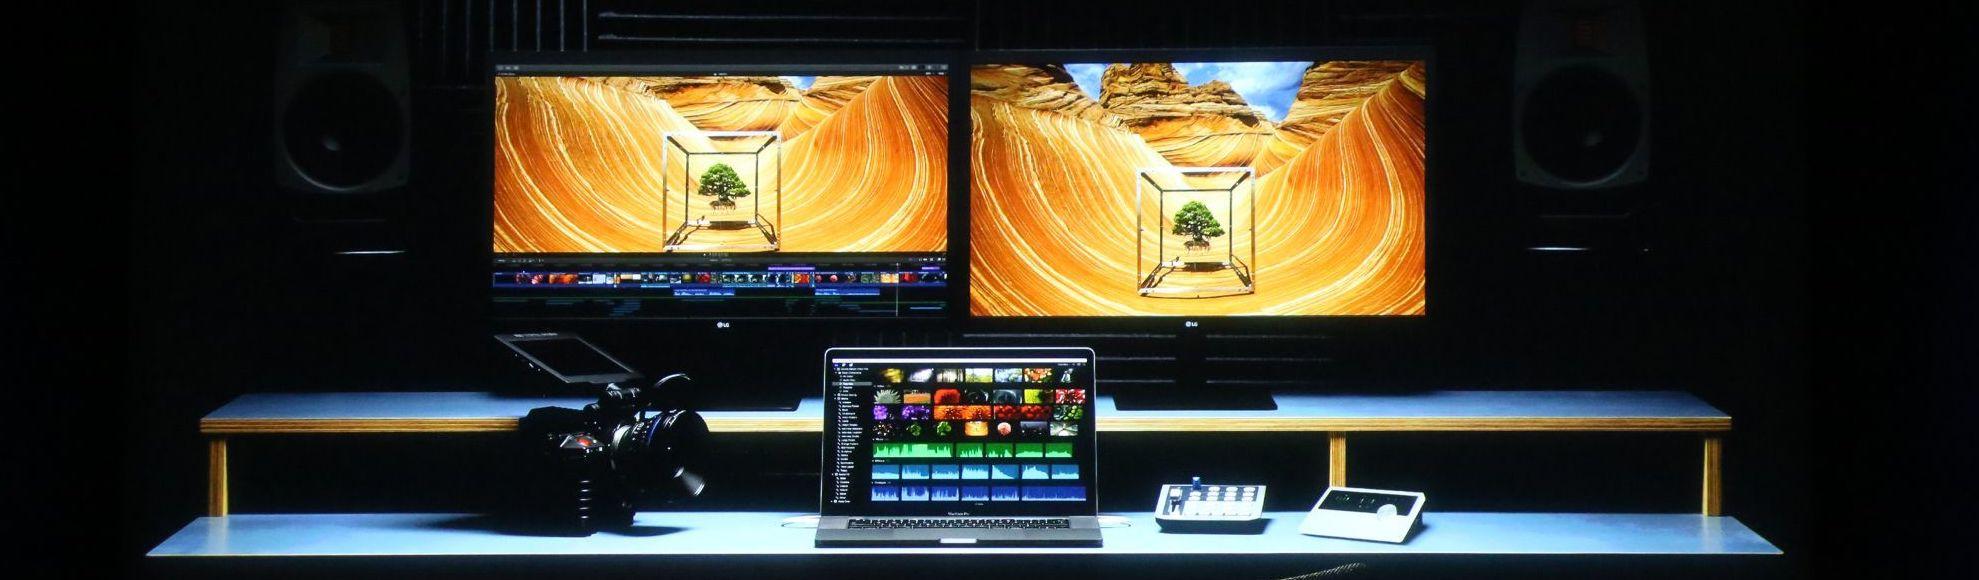 LG 5K Ultrafine